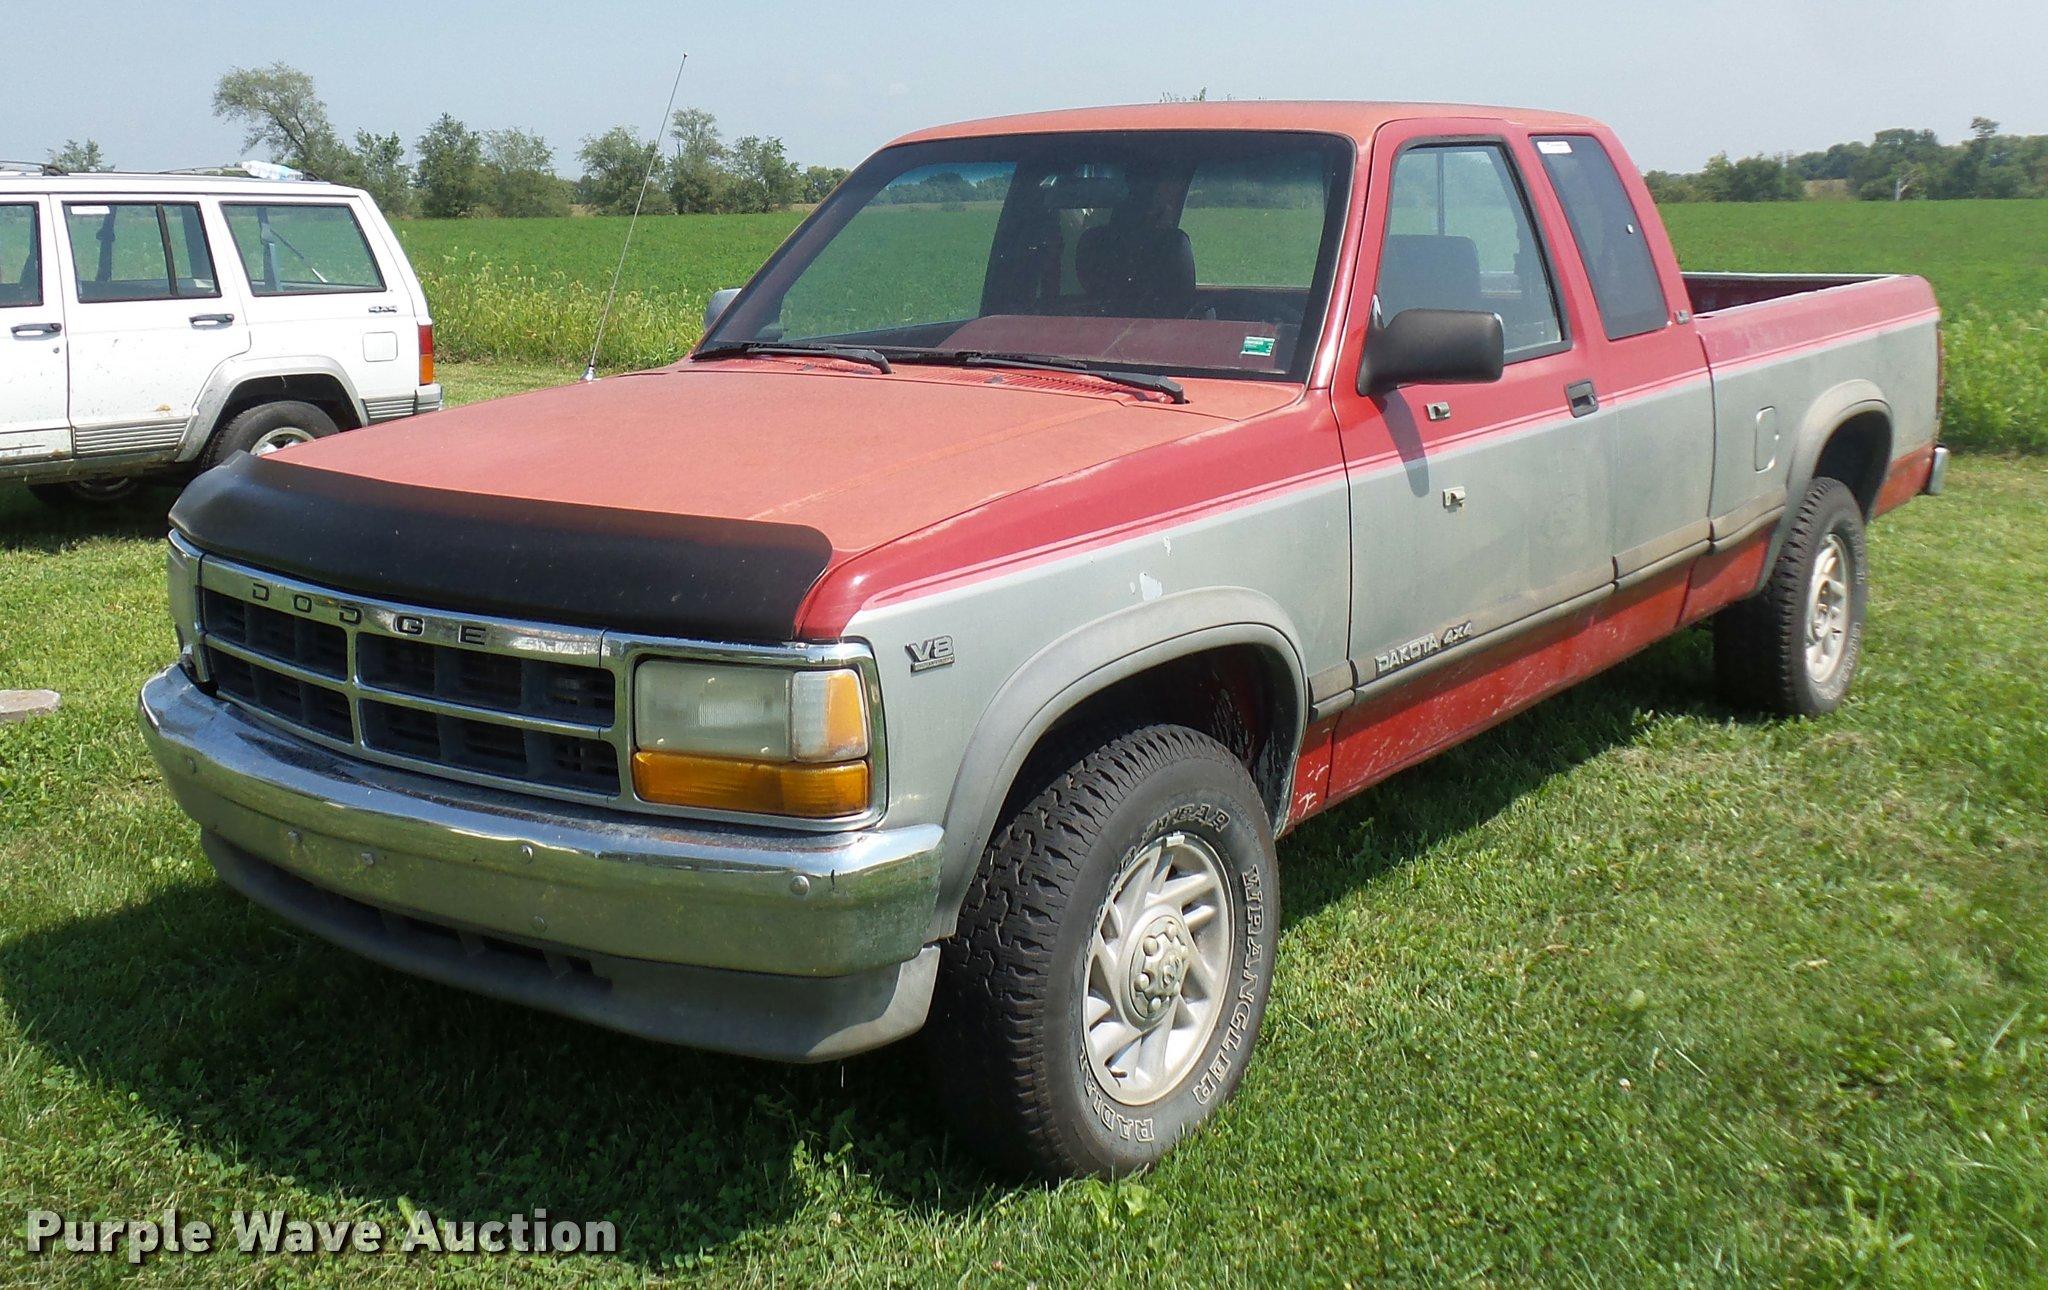 1991 dodge dakota club cab pickup truck in harrisonville mo item dp9206 sold purple wave 1991 dodge dakota club cab pickup truck